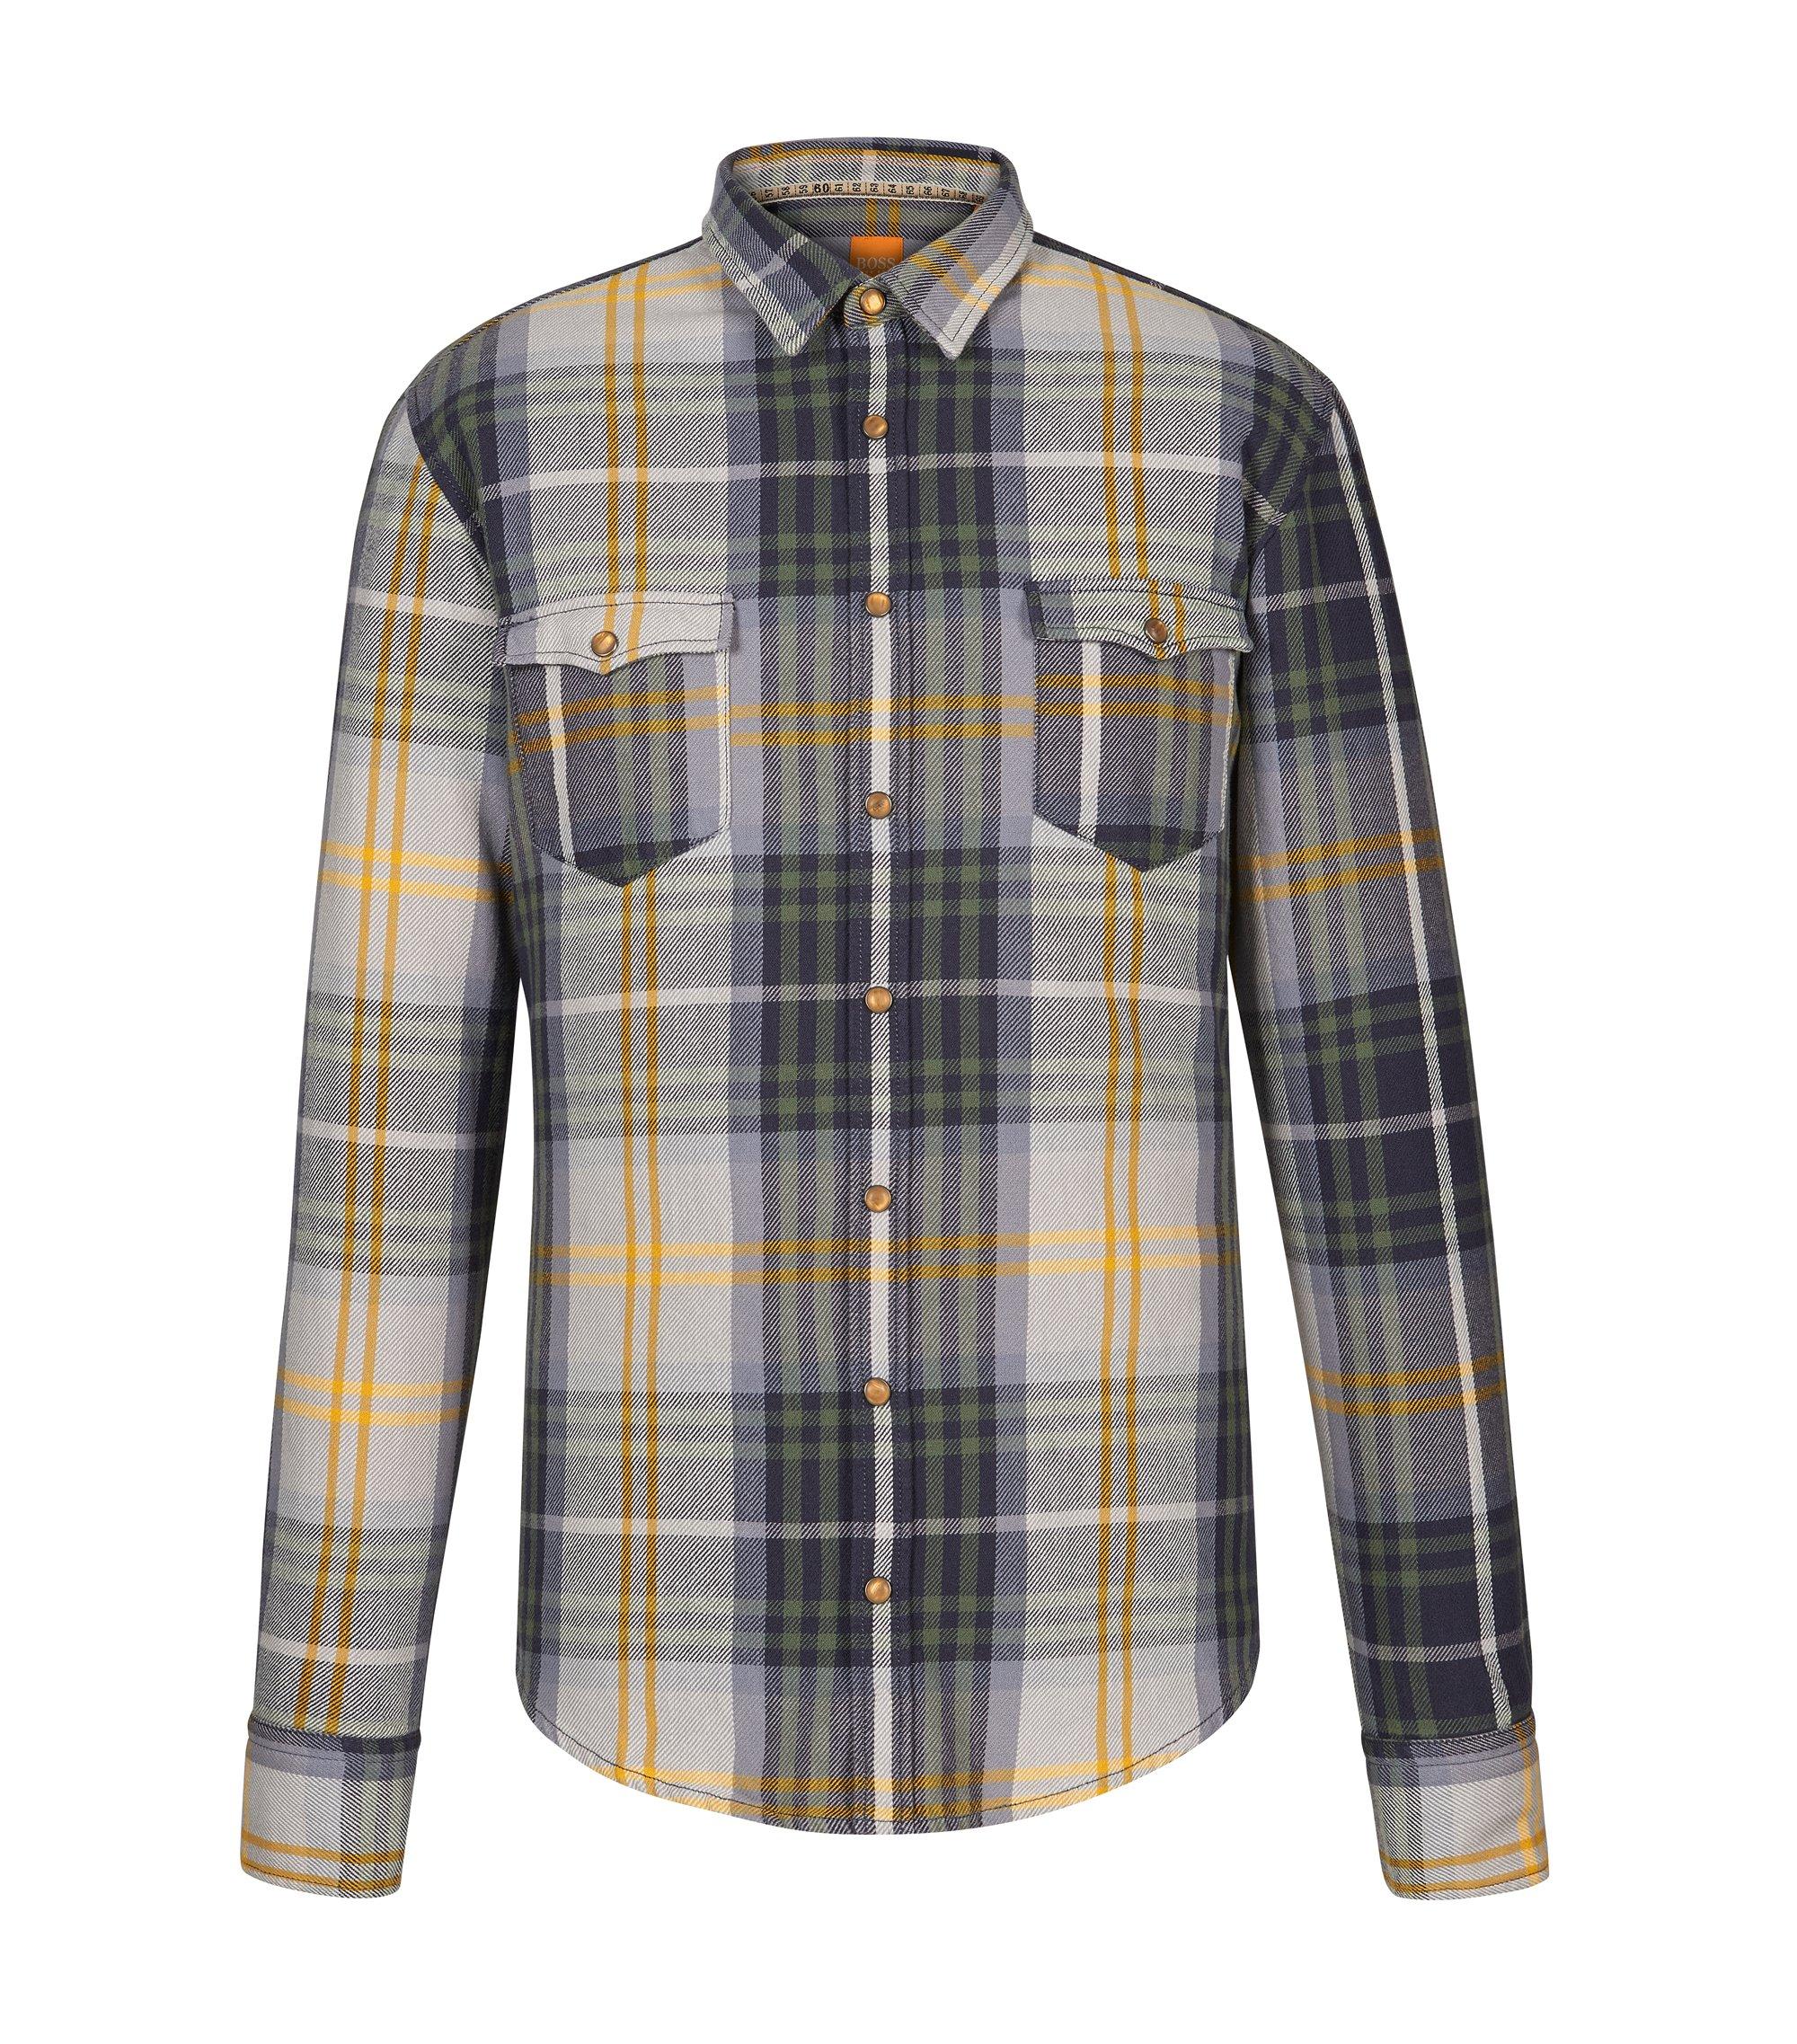 Plaid Cotton Button Down Shirt, Slim Fit | EdoslimE, Green